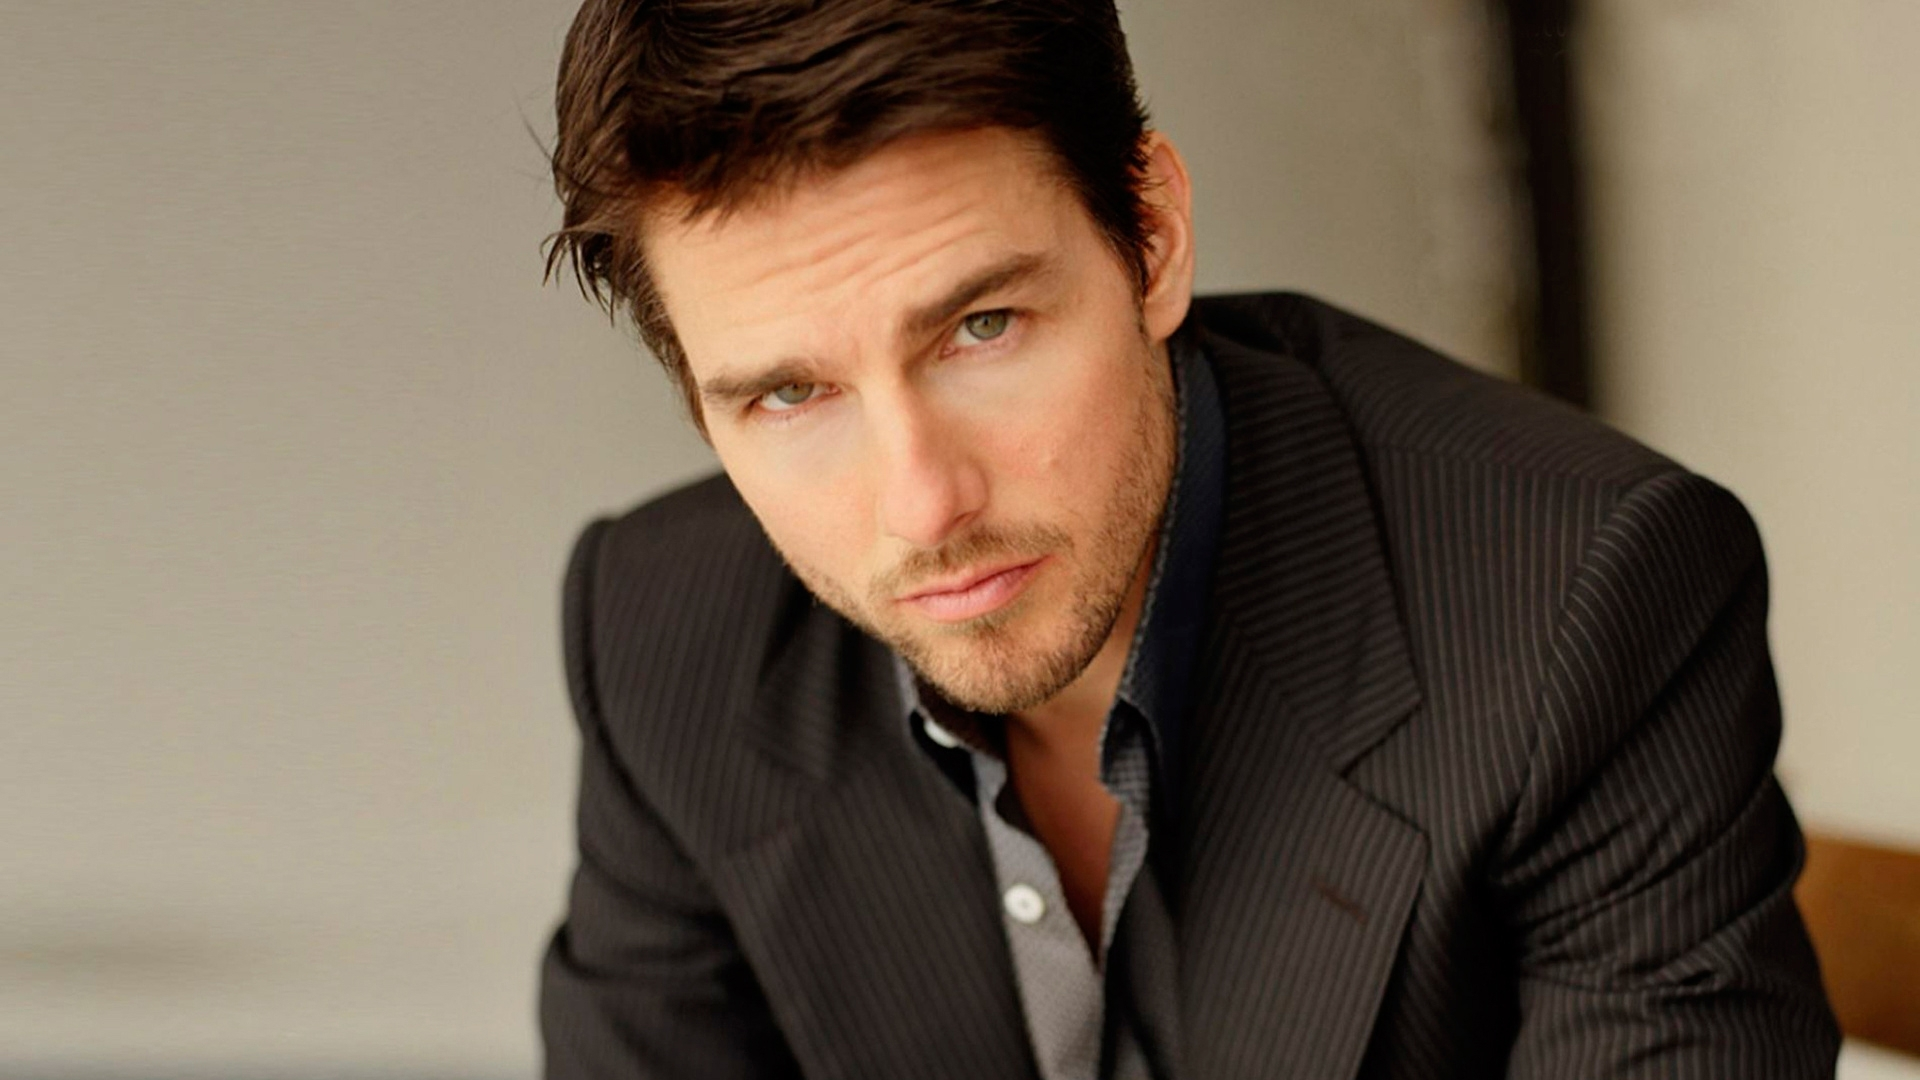 Tom Cruise Photos 6921040 1920x1080